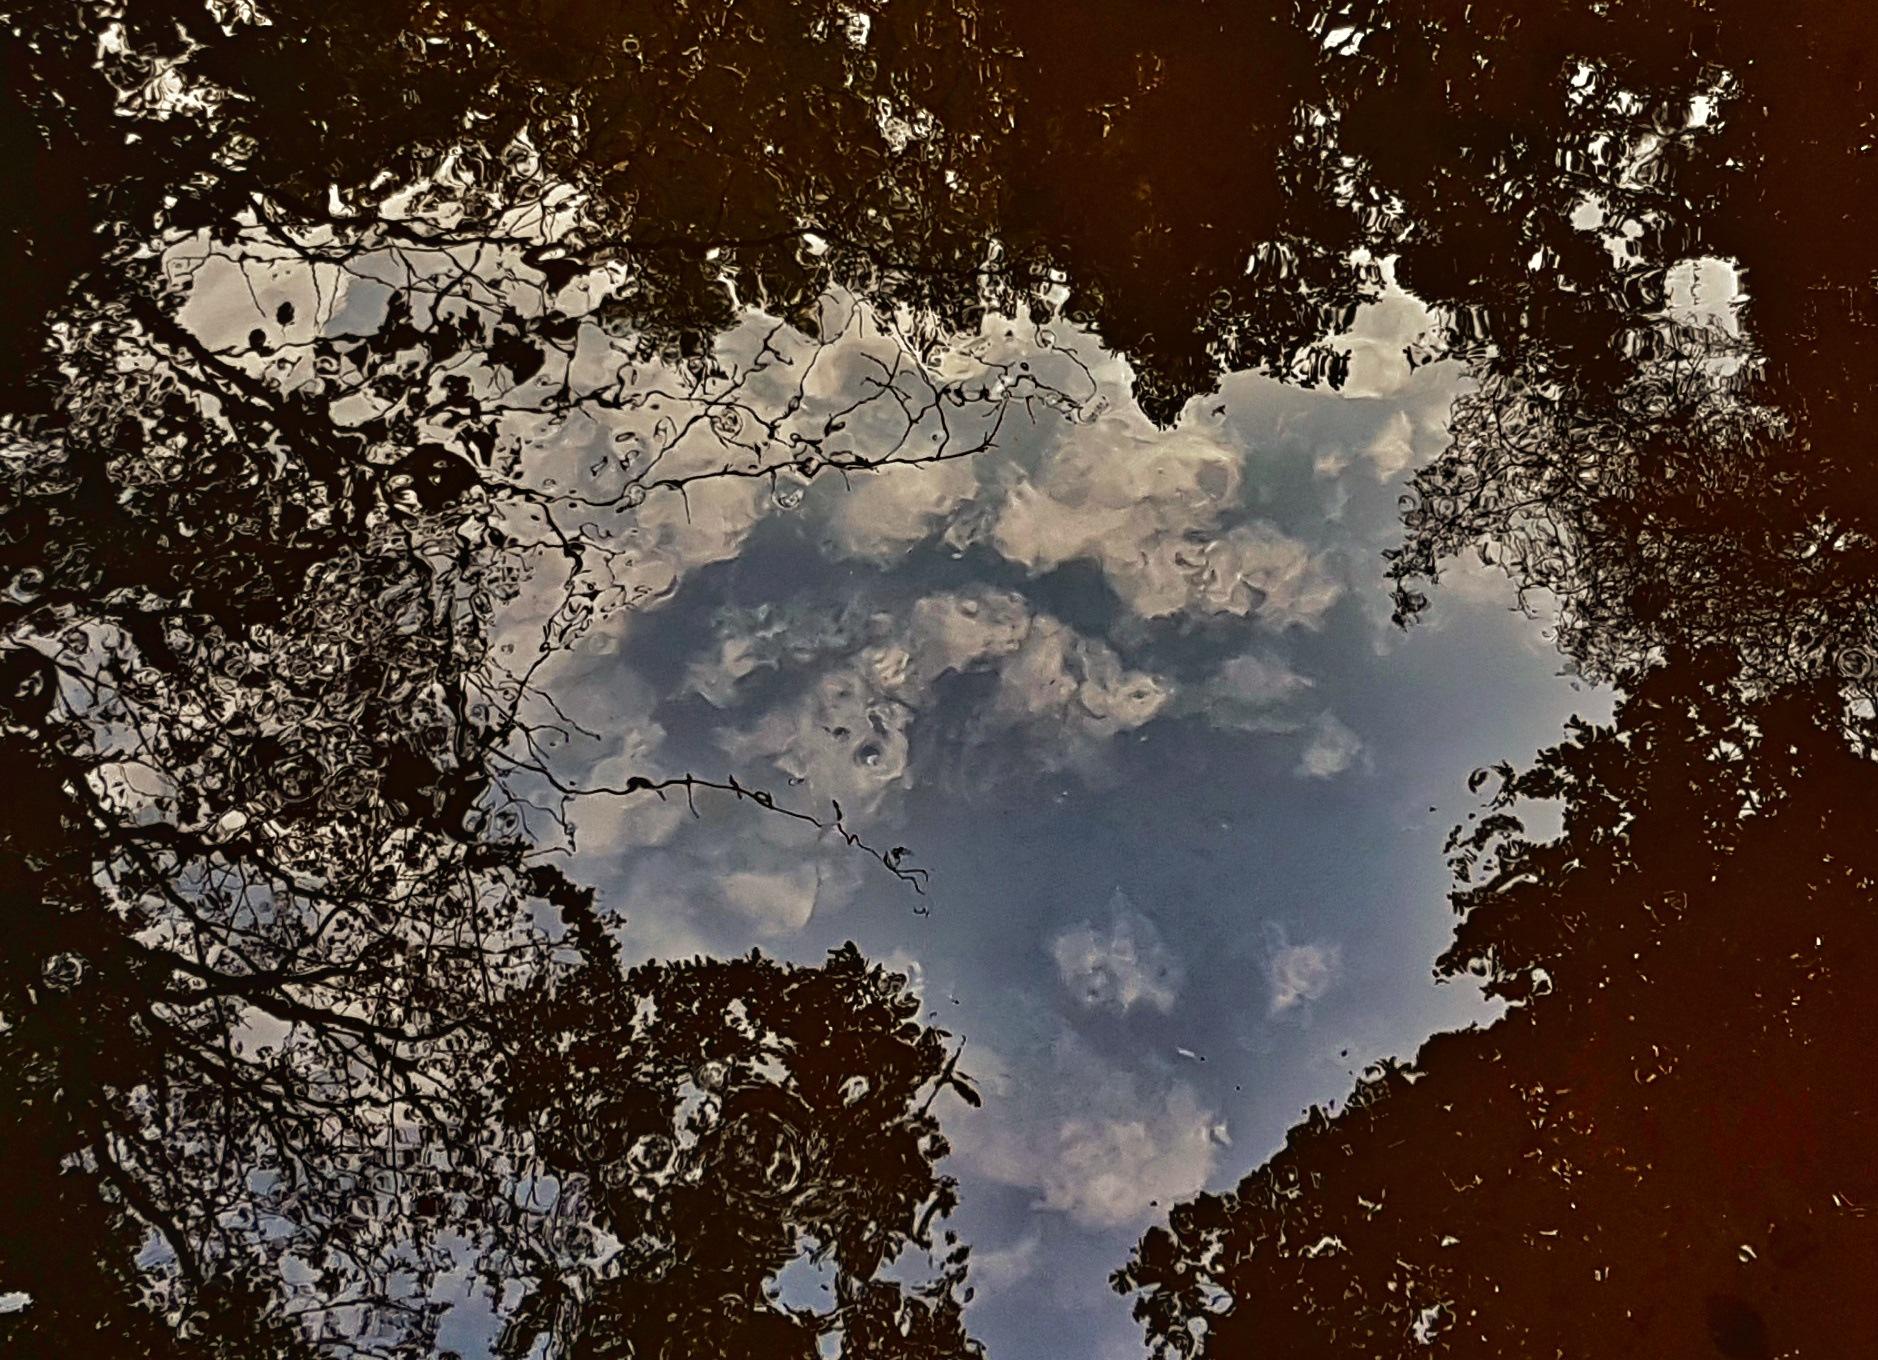 Clouds mirroring in the stream. by Jannie Looge